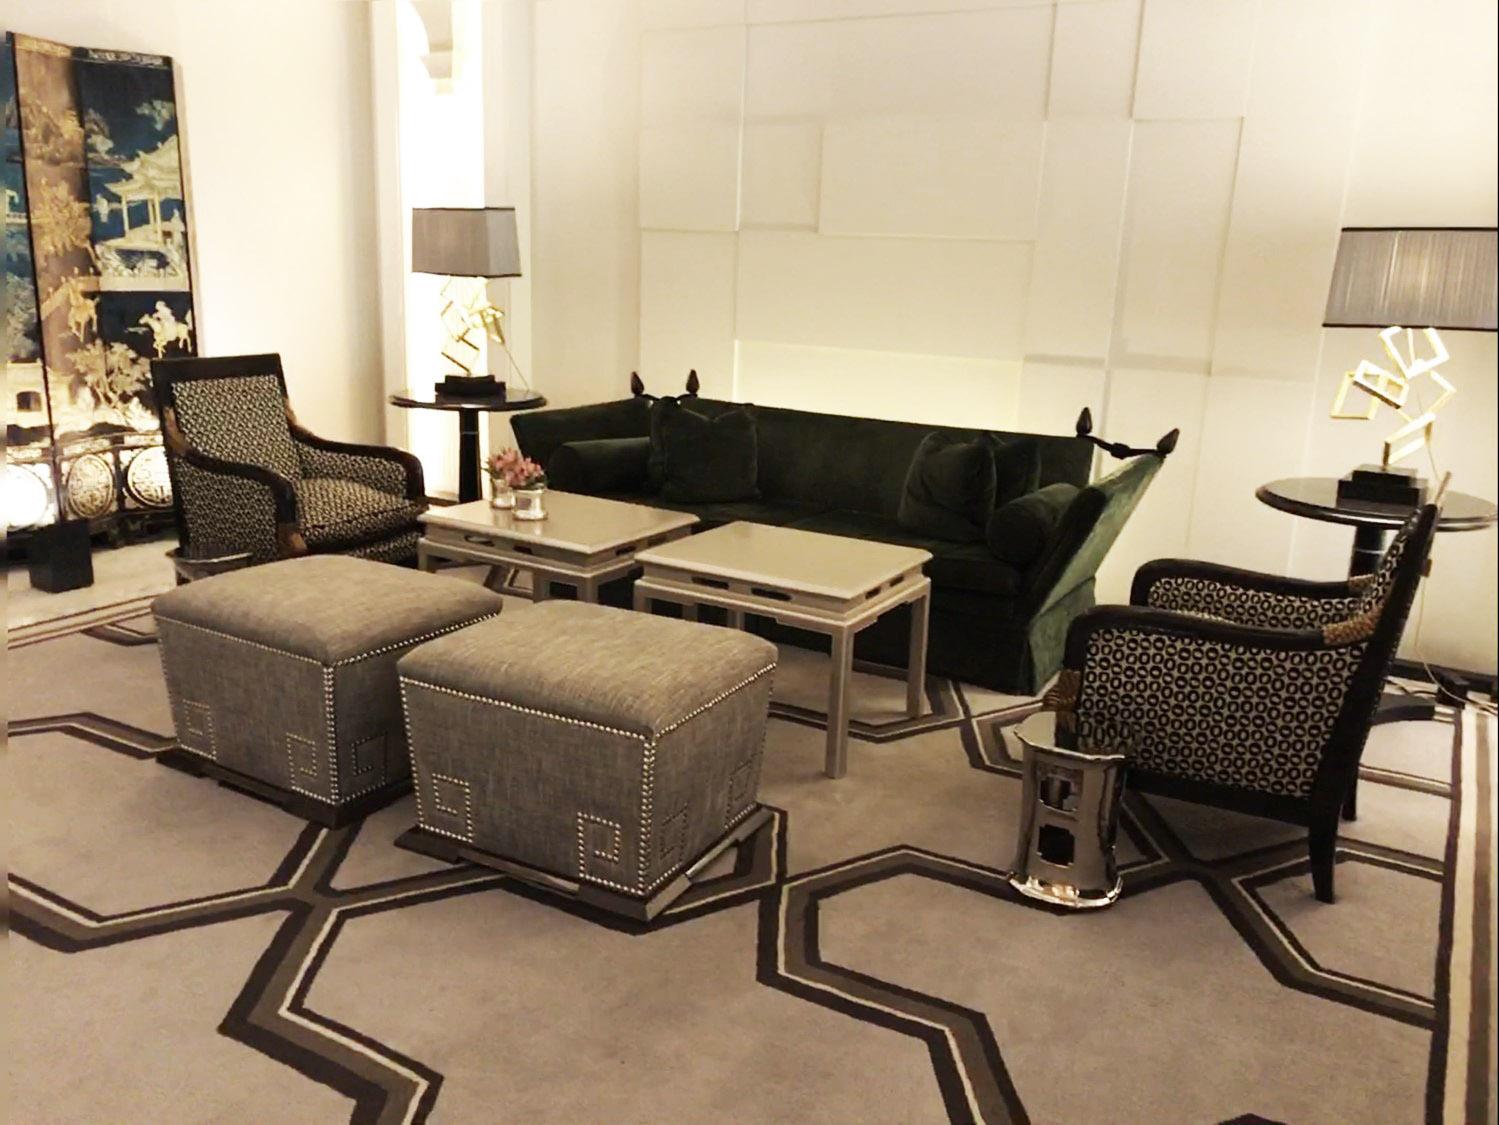 Villa Magna Hotel lounge